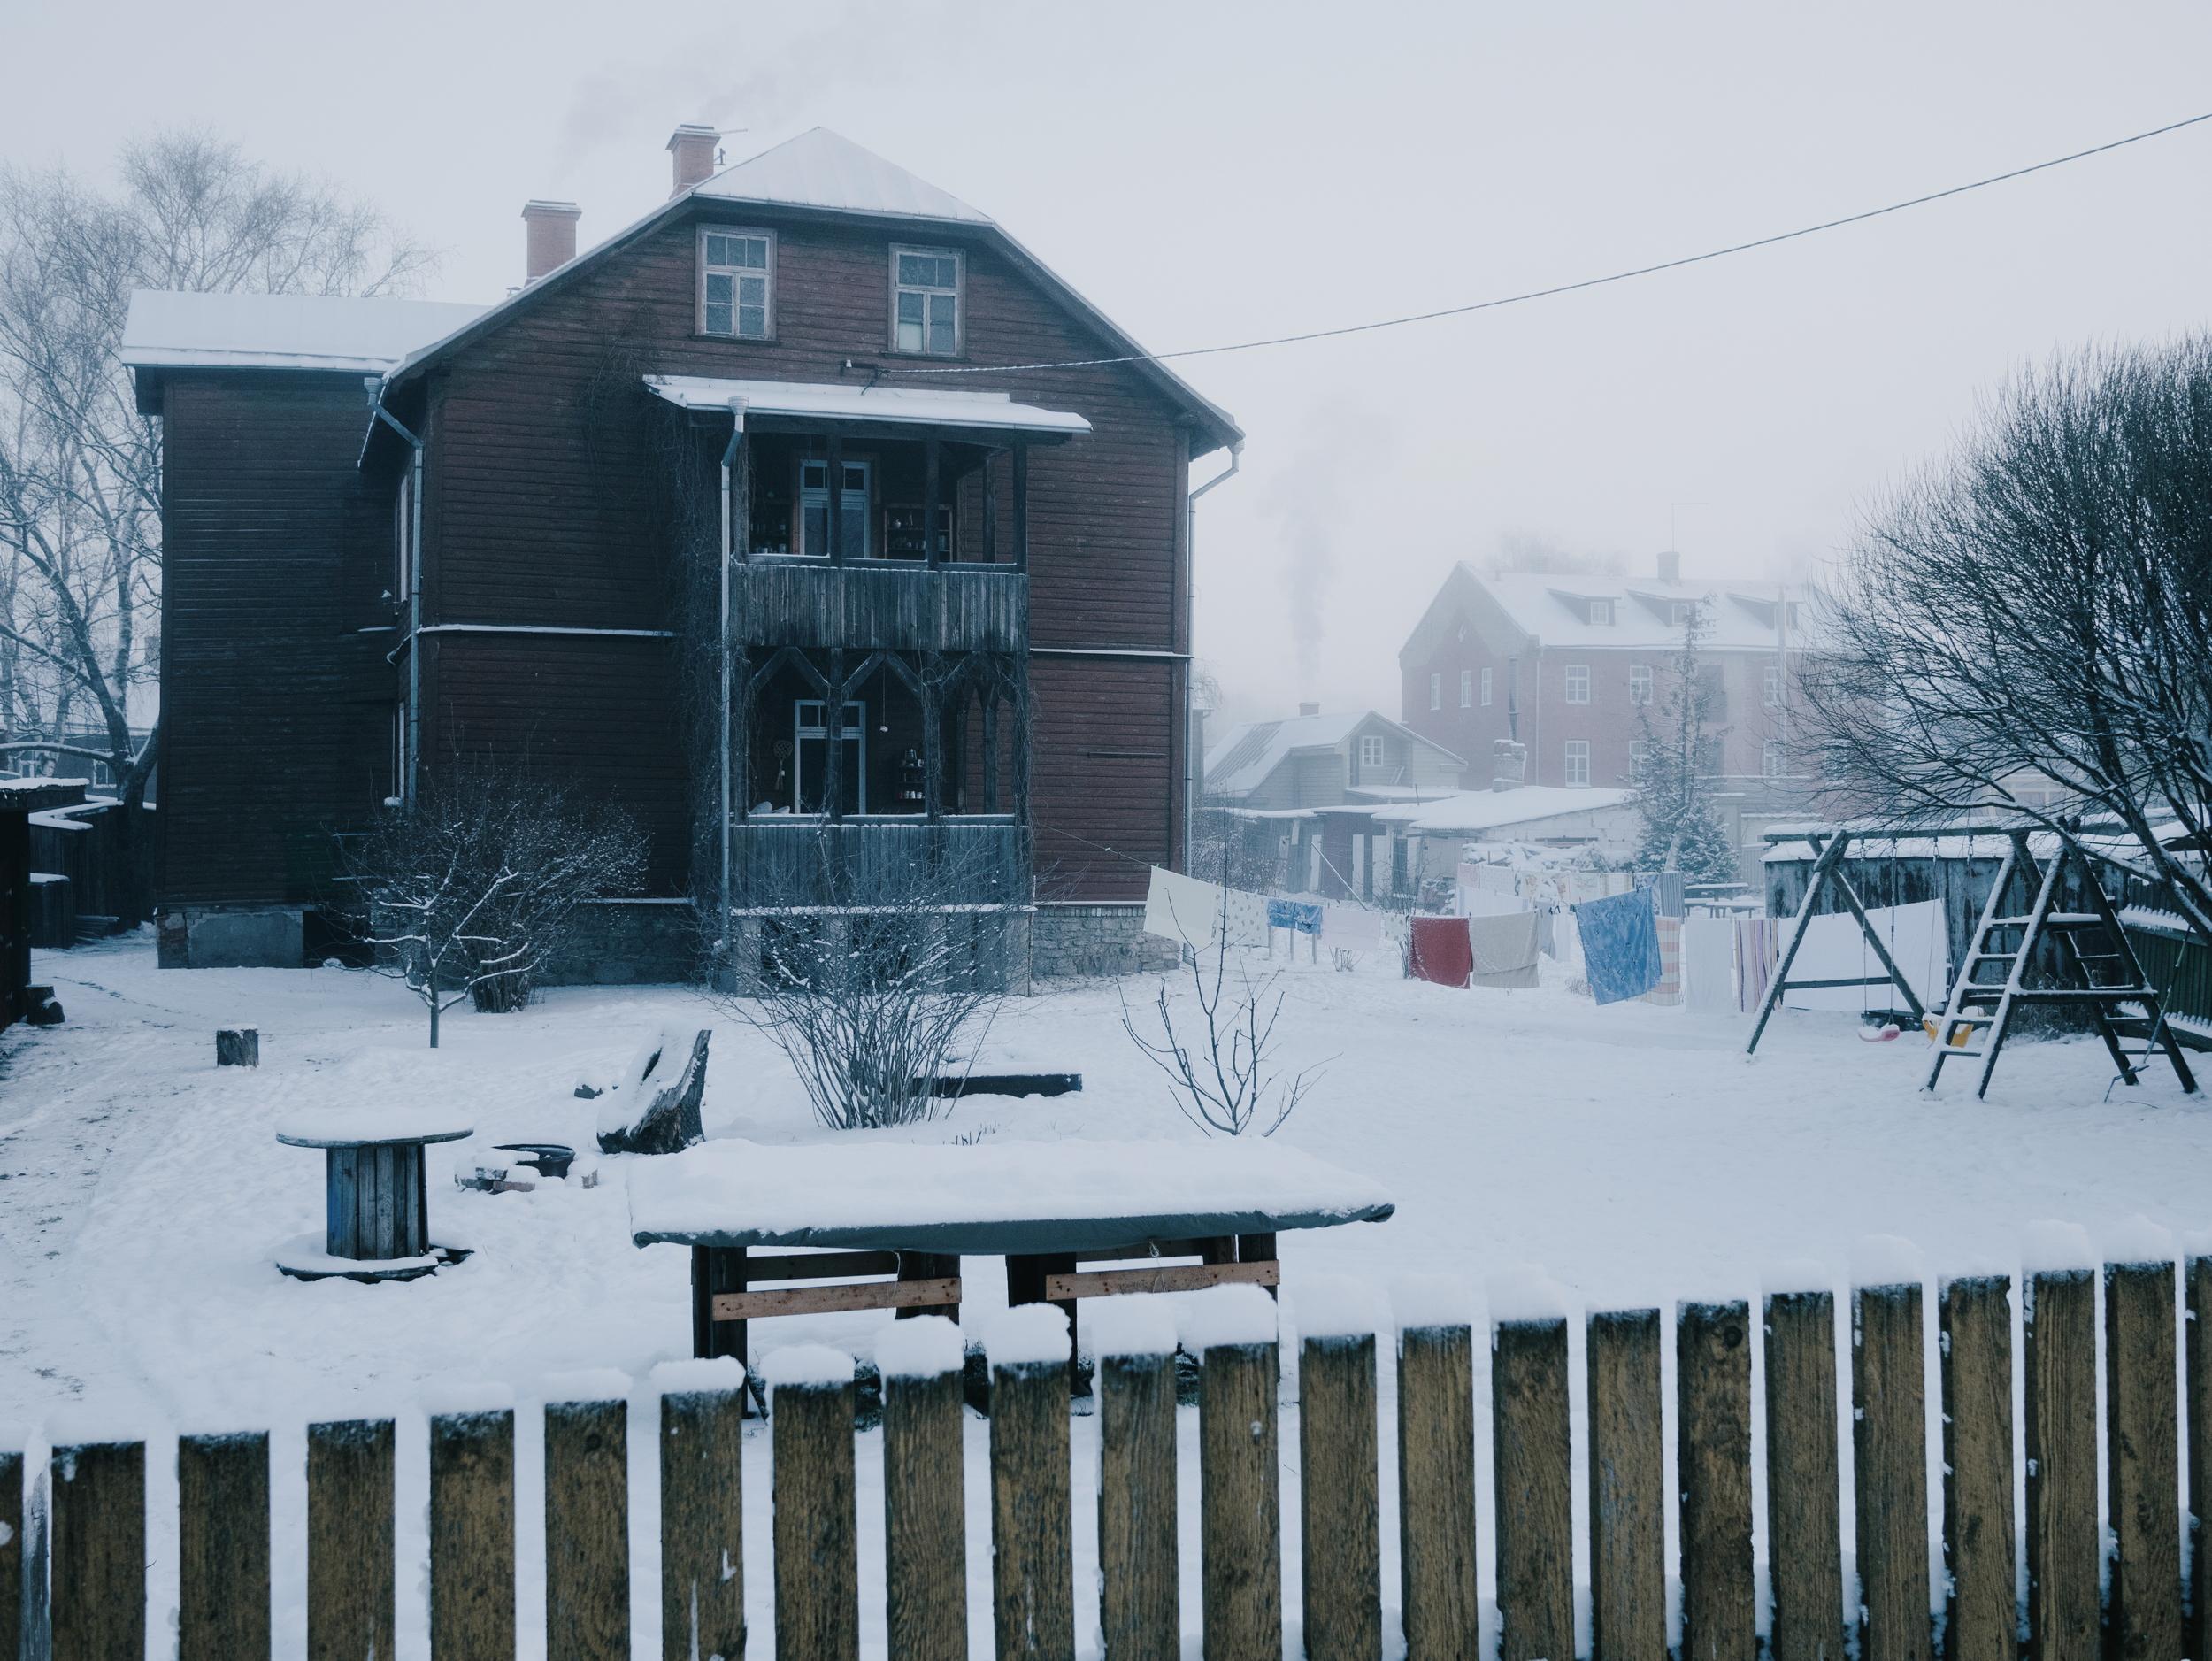 Supilinn, Tartu, Estonia, January 2016